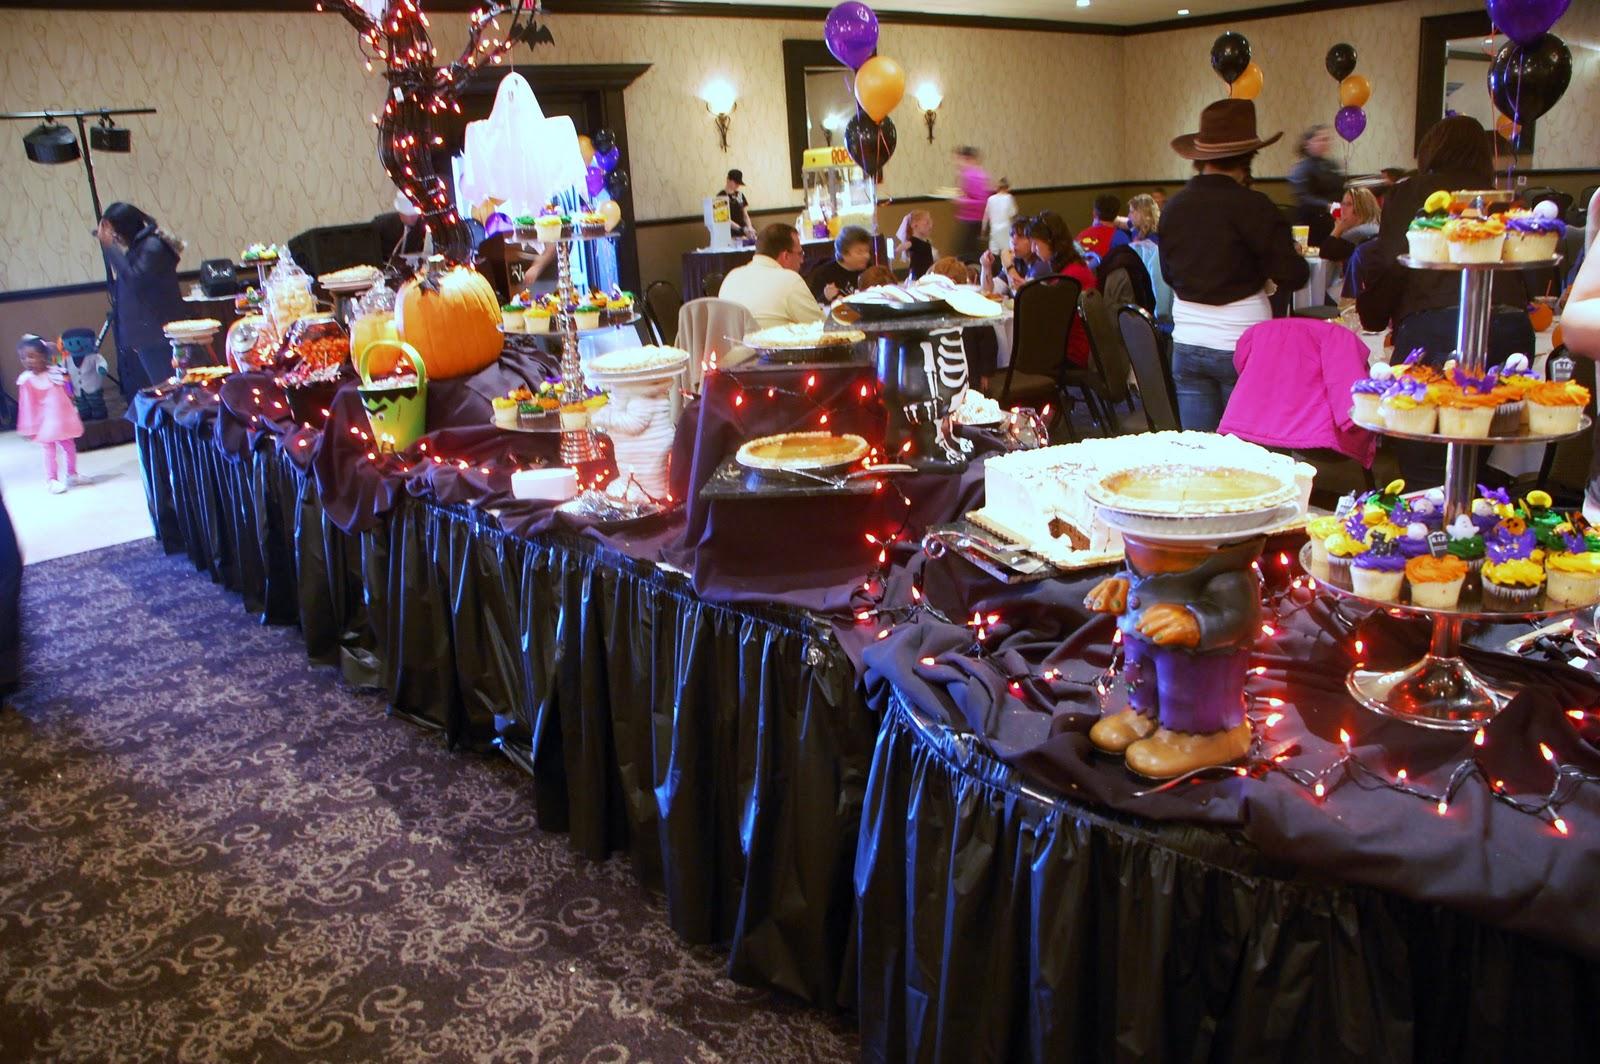 Thar She Sews Matador Costume Hits The Halloween Party